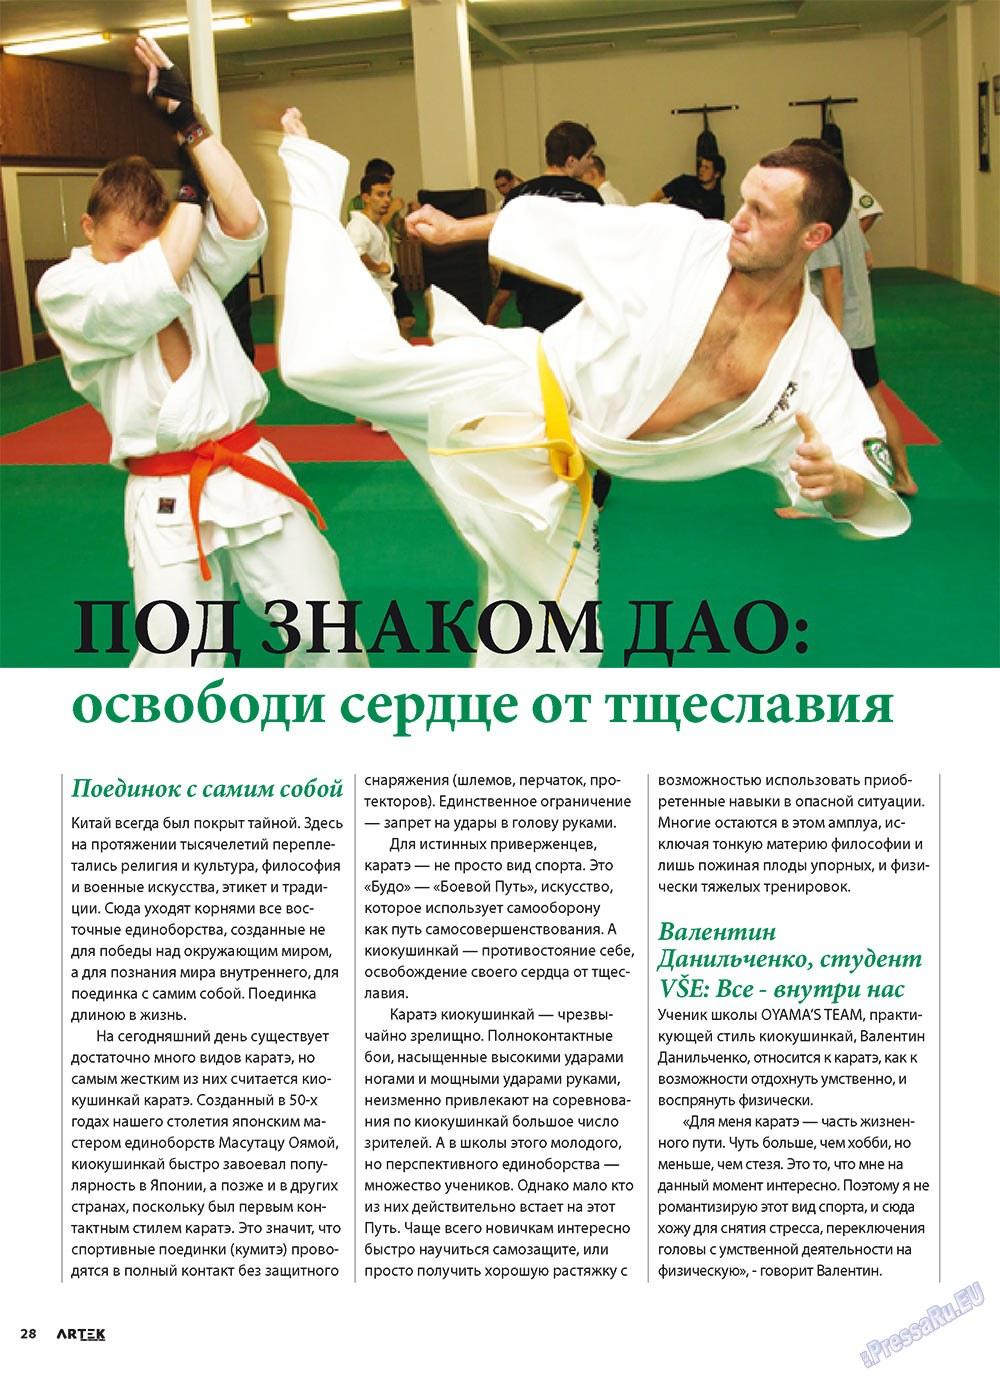 Артек (журнал). 2010 год, номер 5, стр. 30